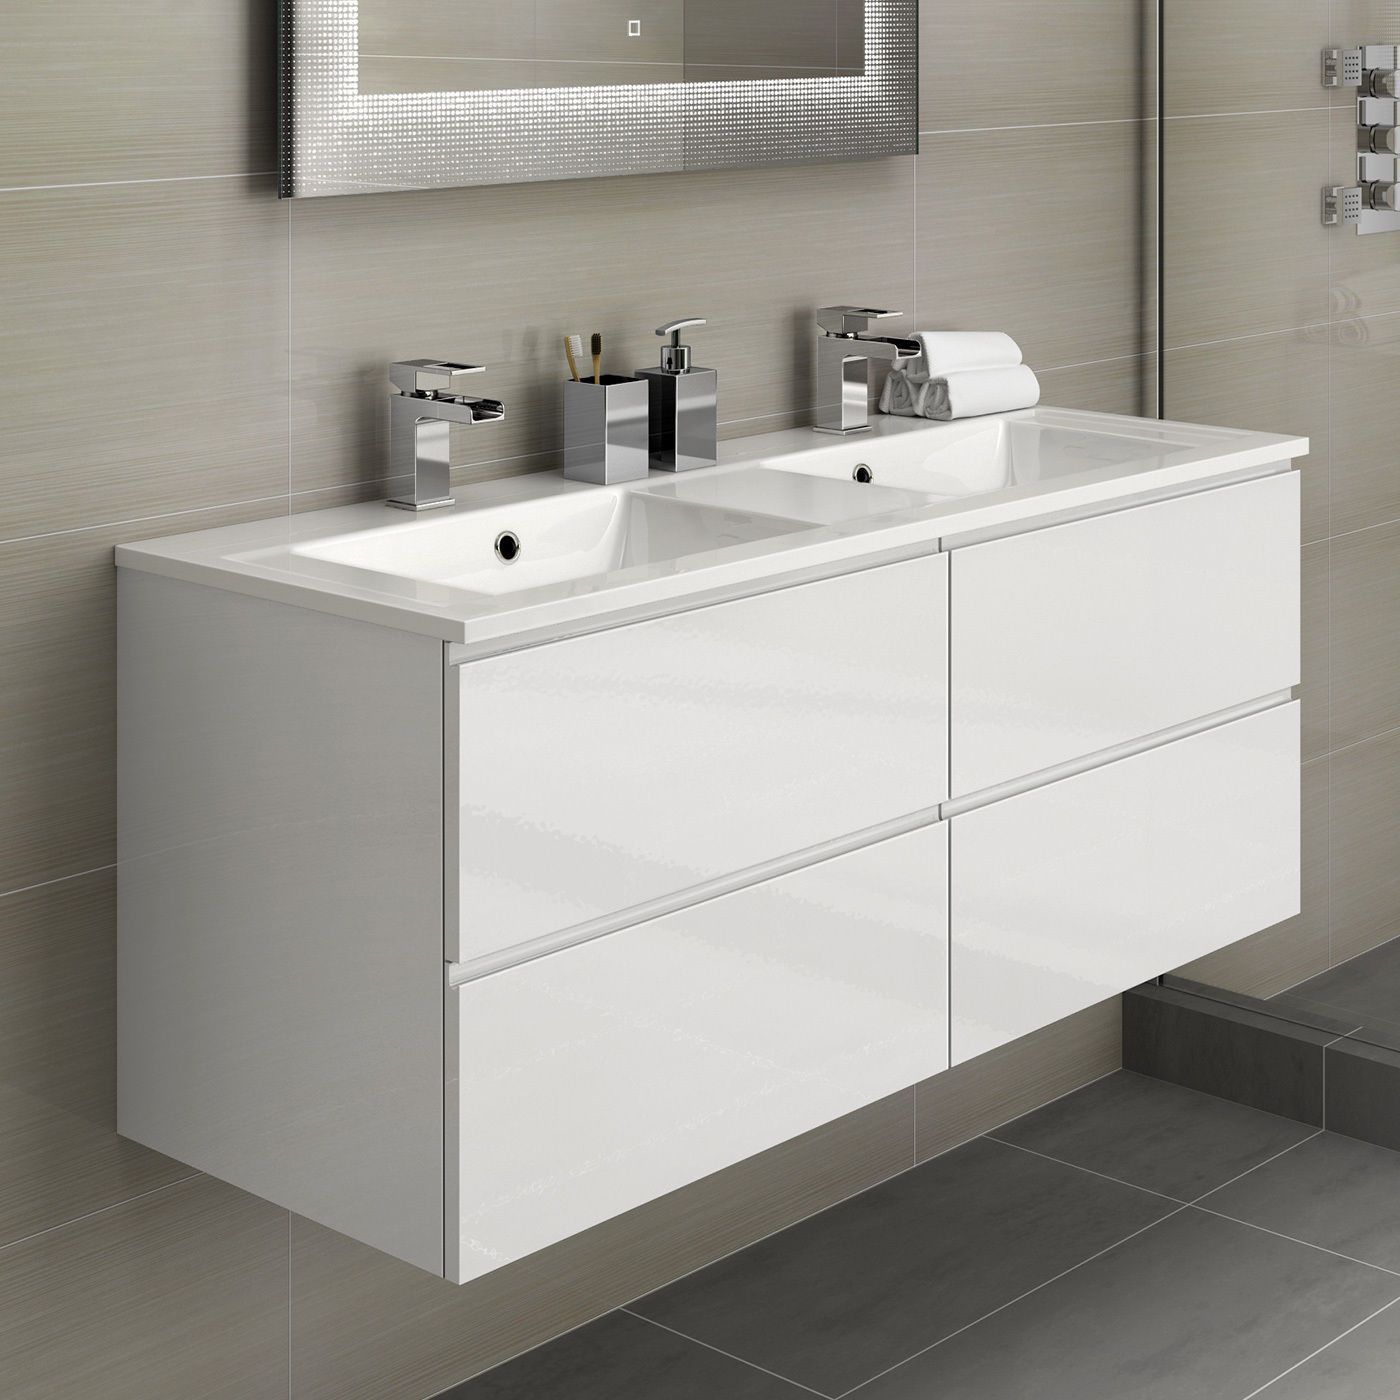 White Double Basin Bathroom Vanity Unit Sink Storage Modern